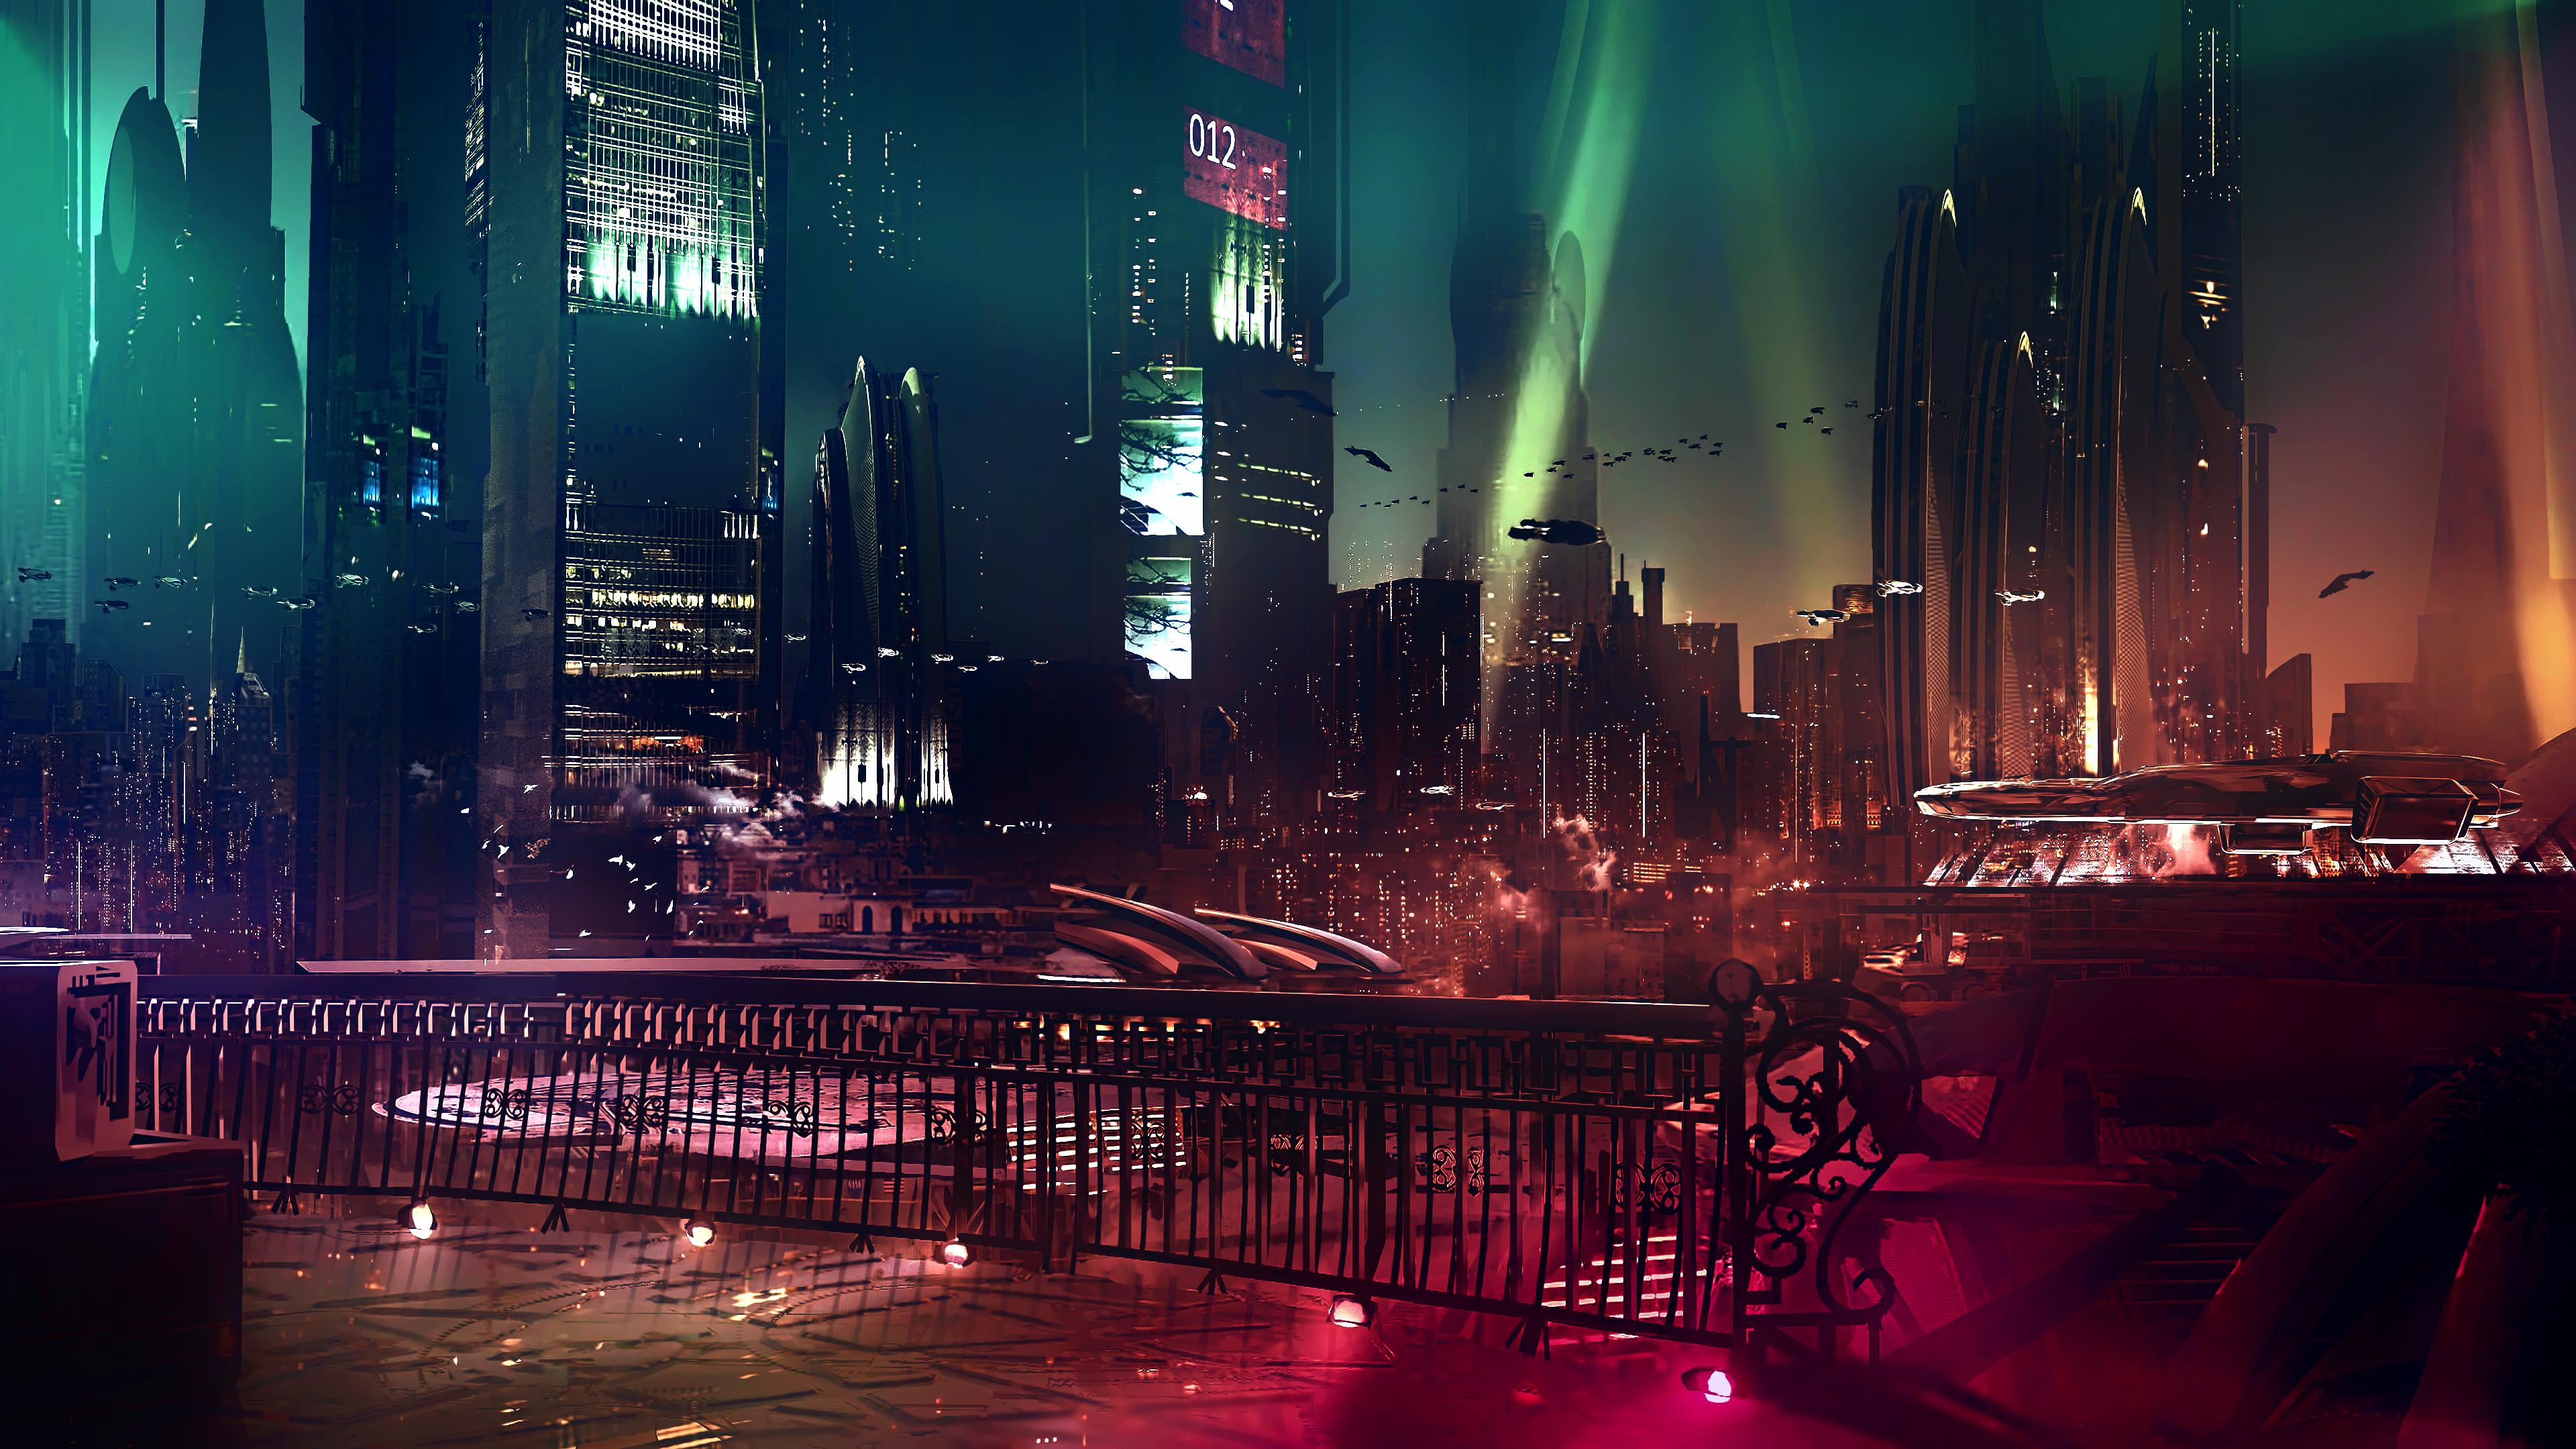 General 3840x2160 cyber science fiction digital art concept art cyberpunk artwork futuristic fantasy art fan art 3D spaceship CGI cityscape futuristic city sunset neon lights neon Bladerunner